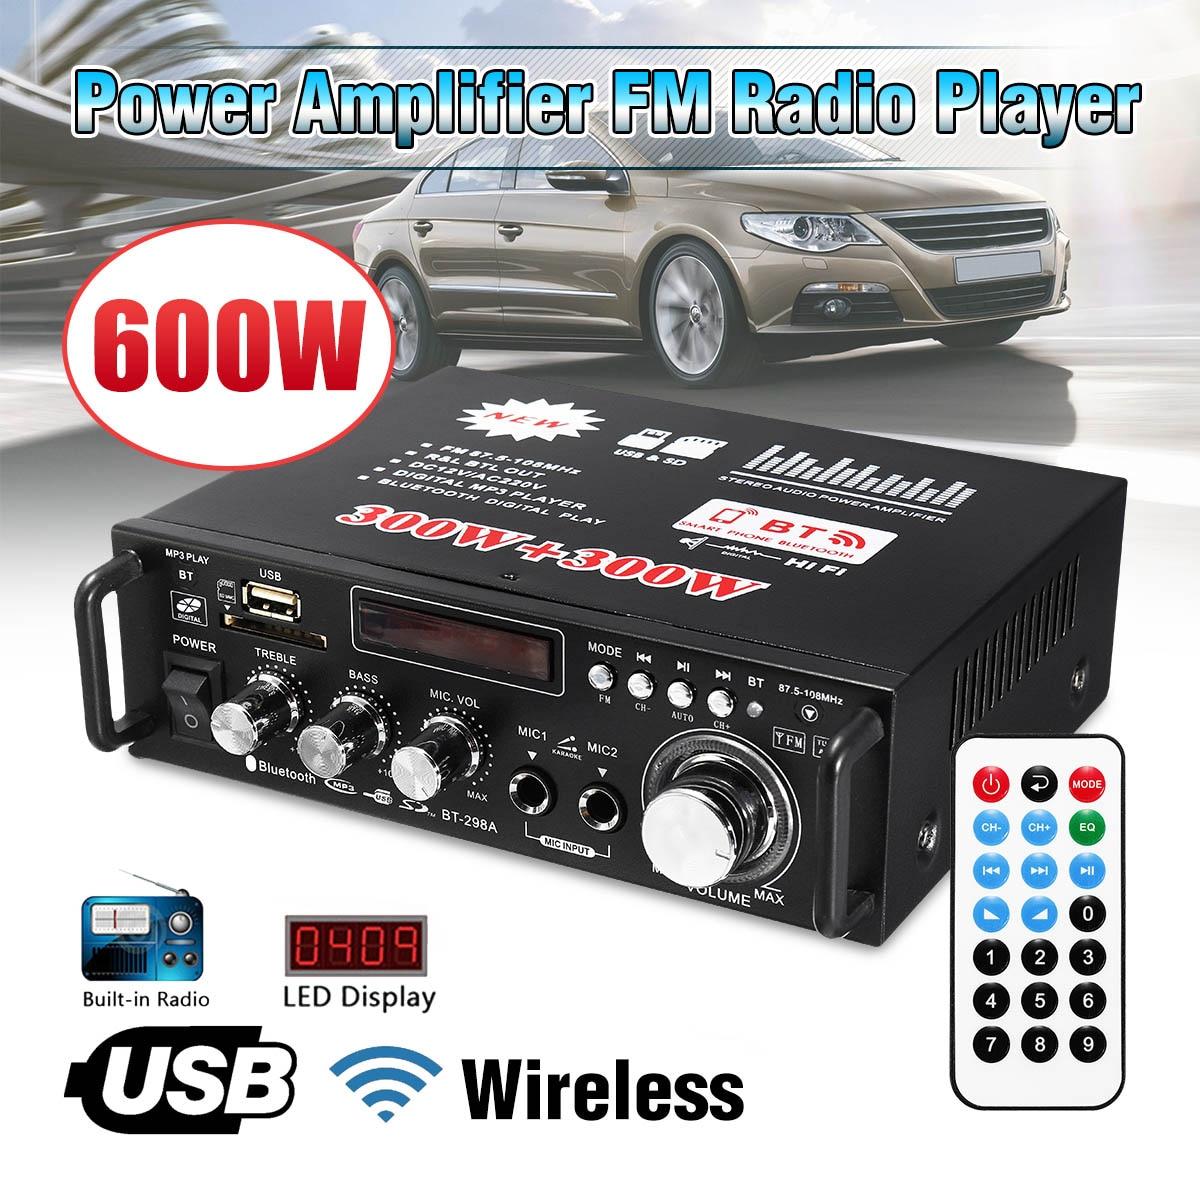 12V/ 220V BT-298A 2CH LCD Display Digital HIFI Audio Stereo Power Amplifier bluetooth FM Radio Car H